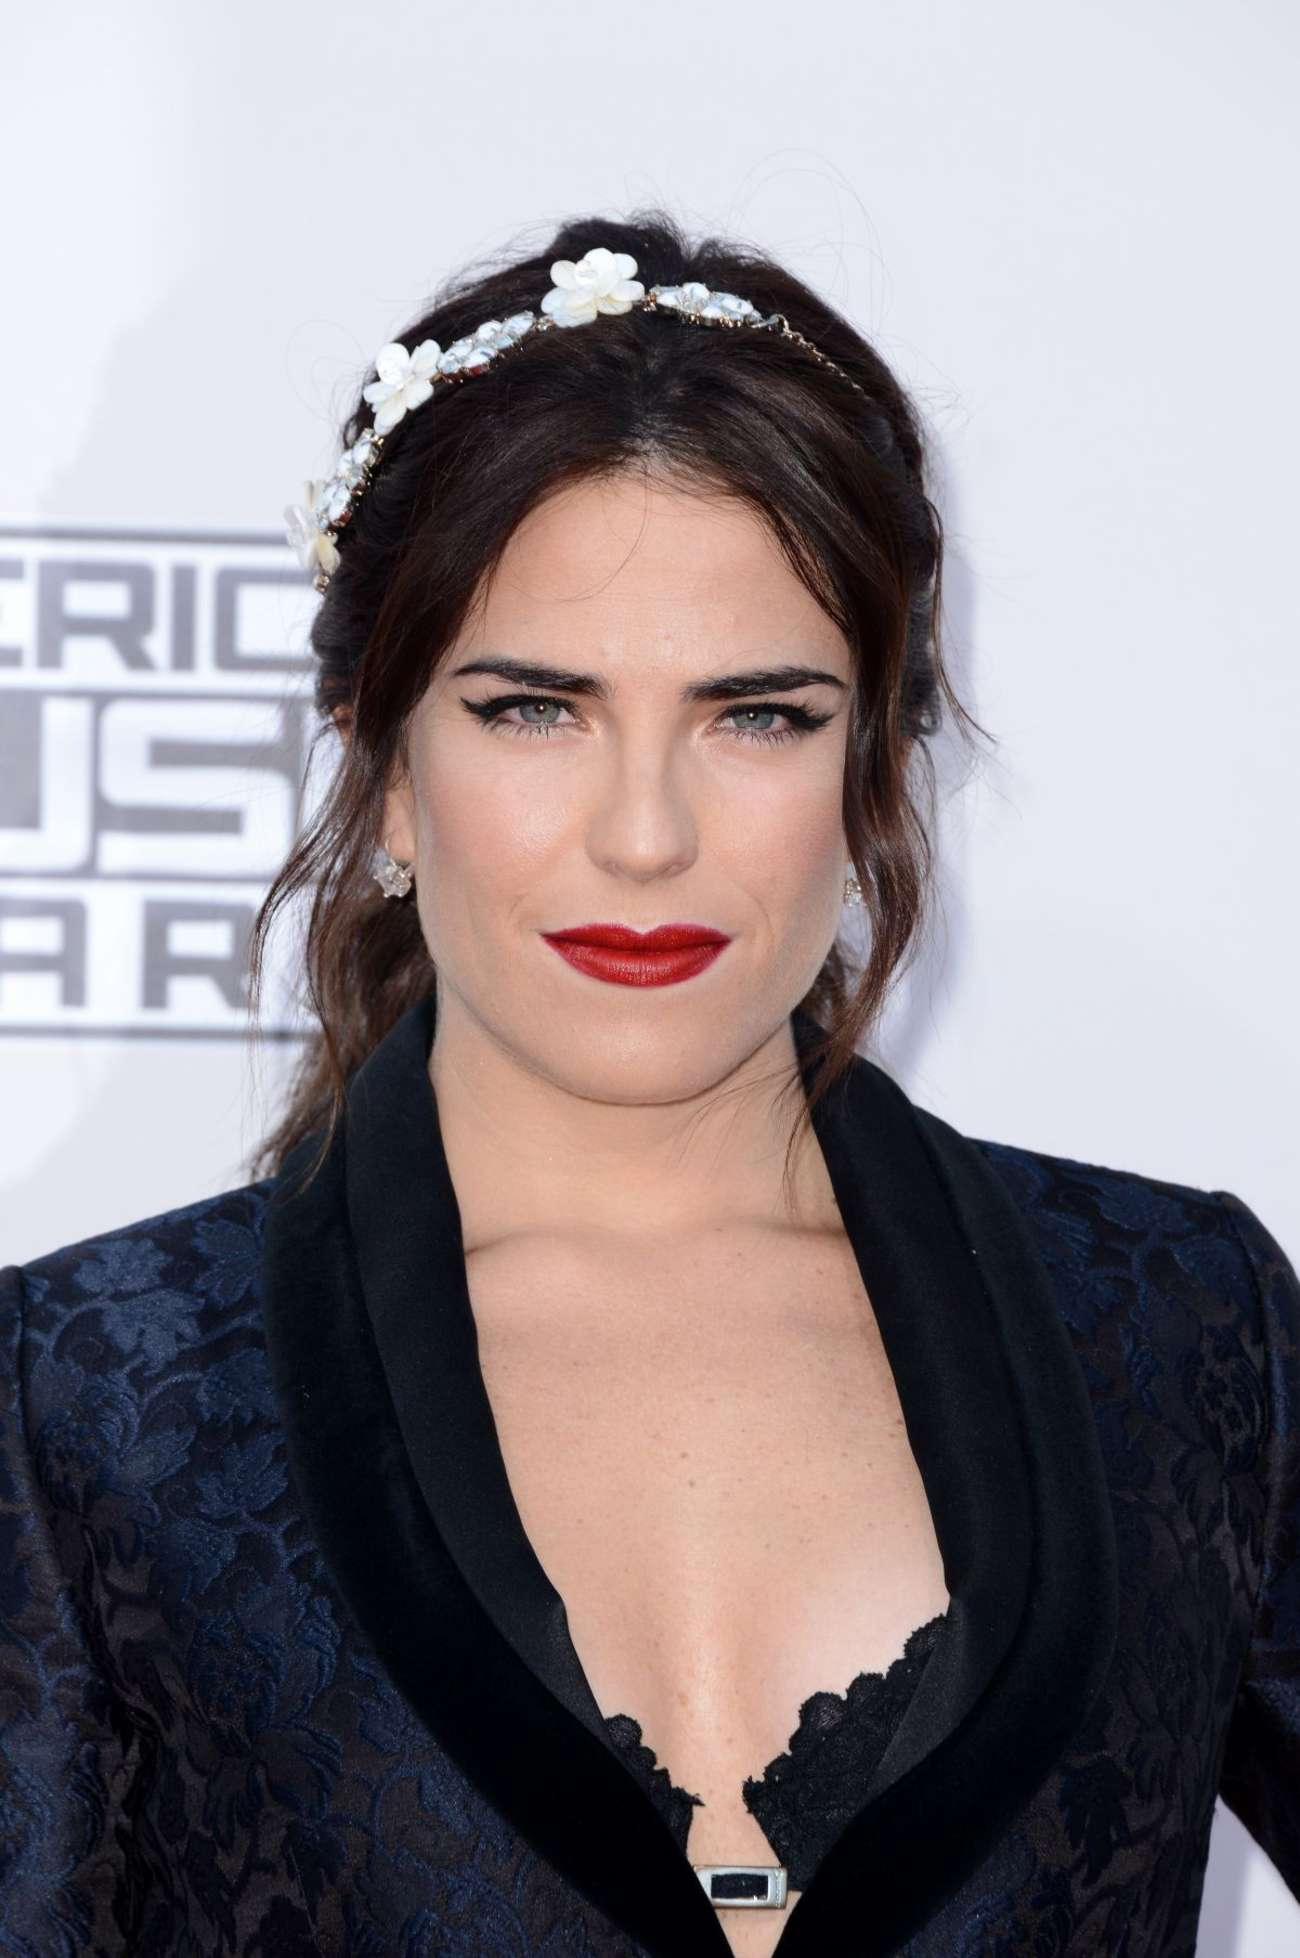 Karla souza 2015 american music awards in los angeles